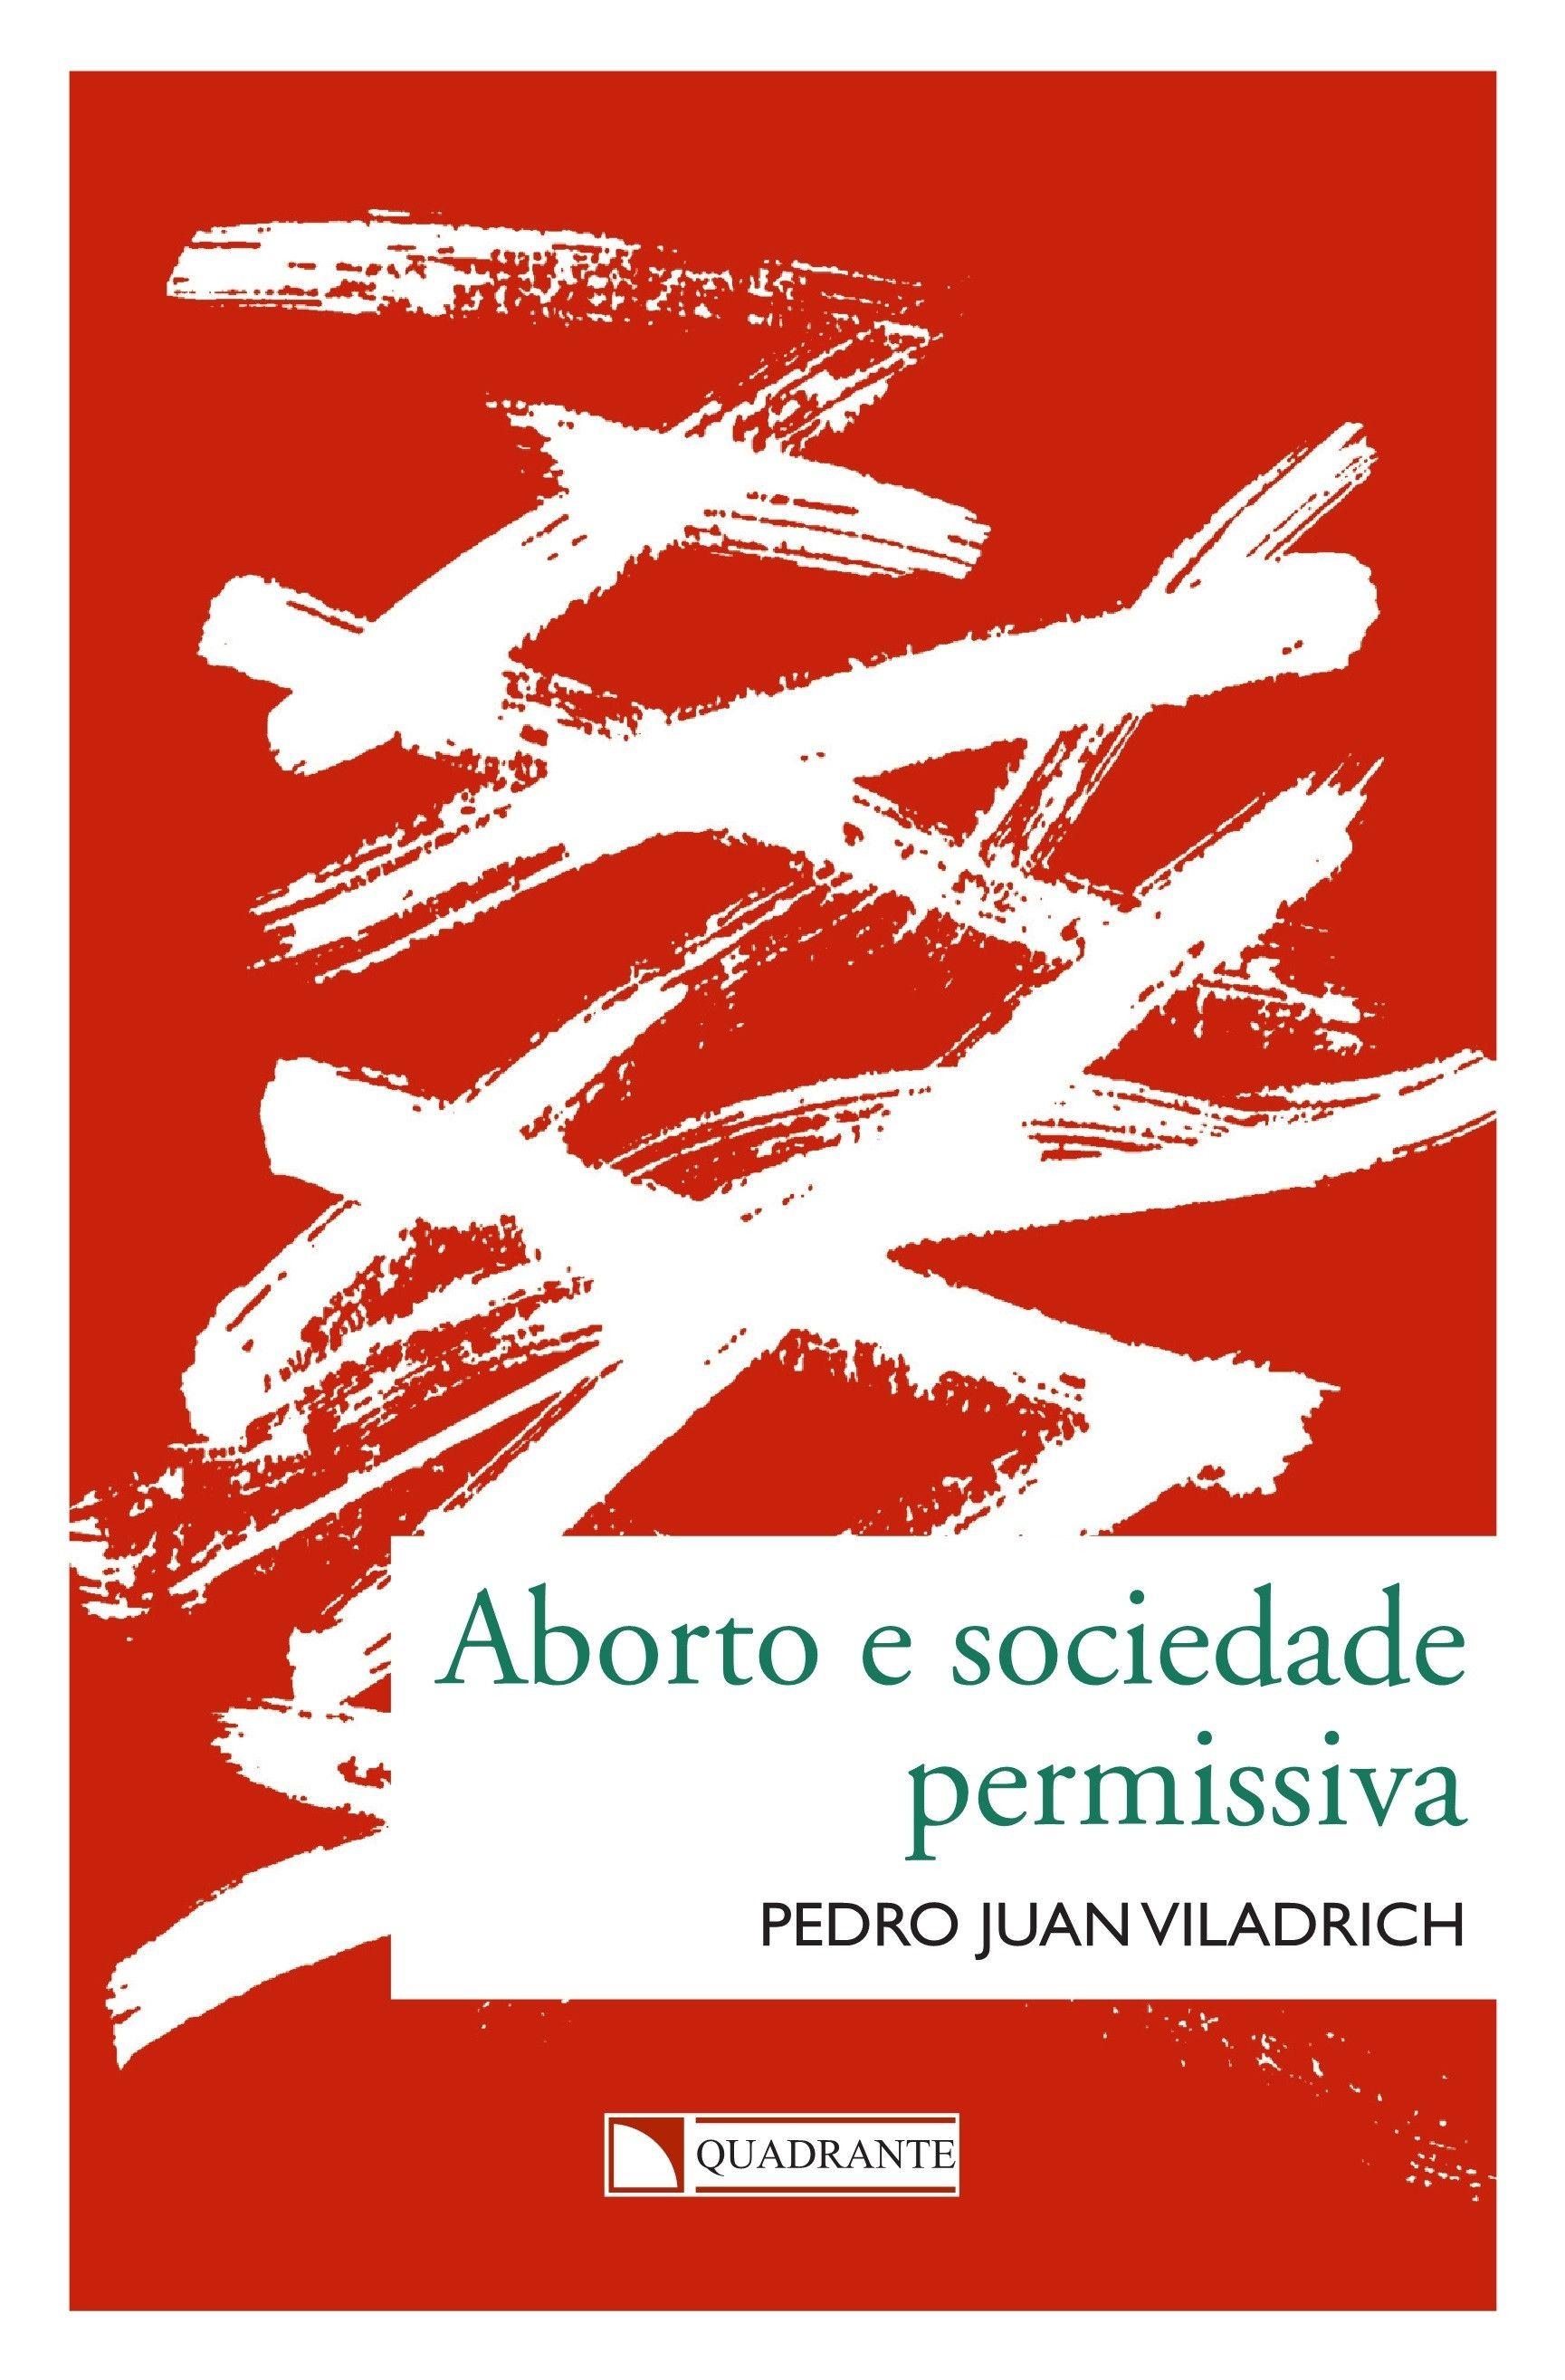 Livro Aborto e sociedade permissiva